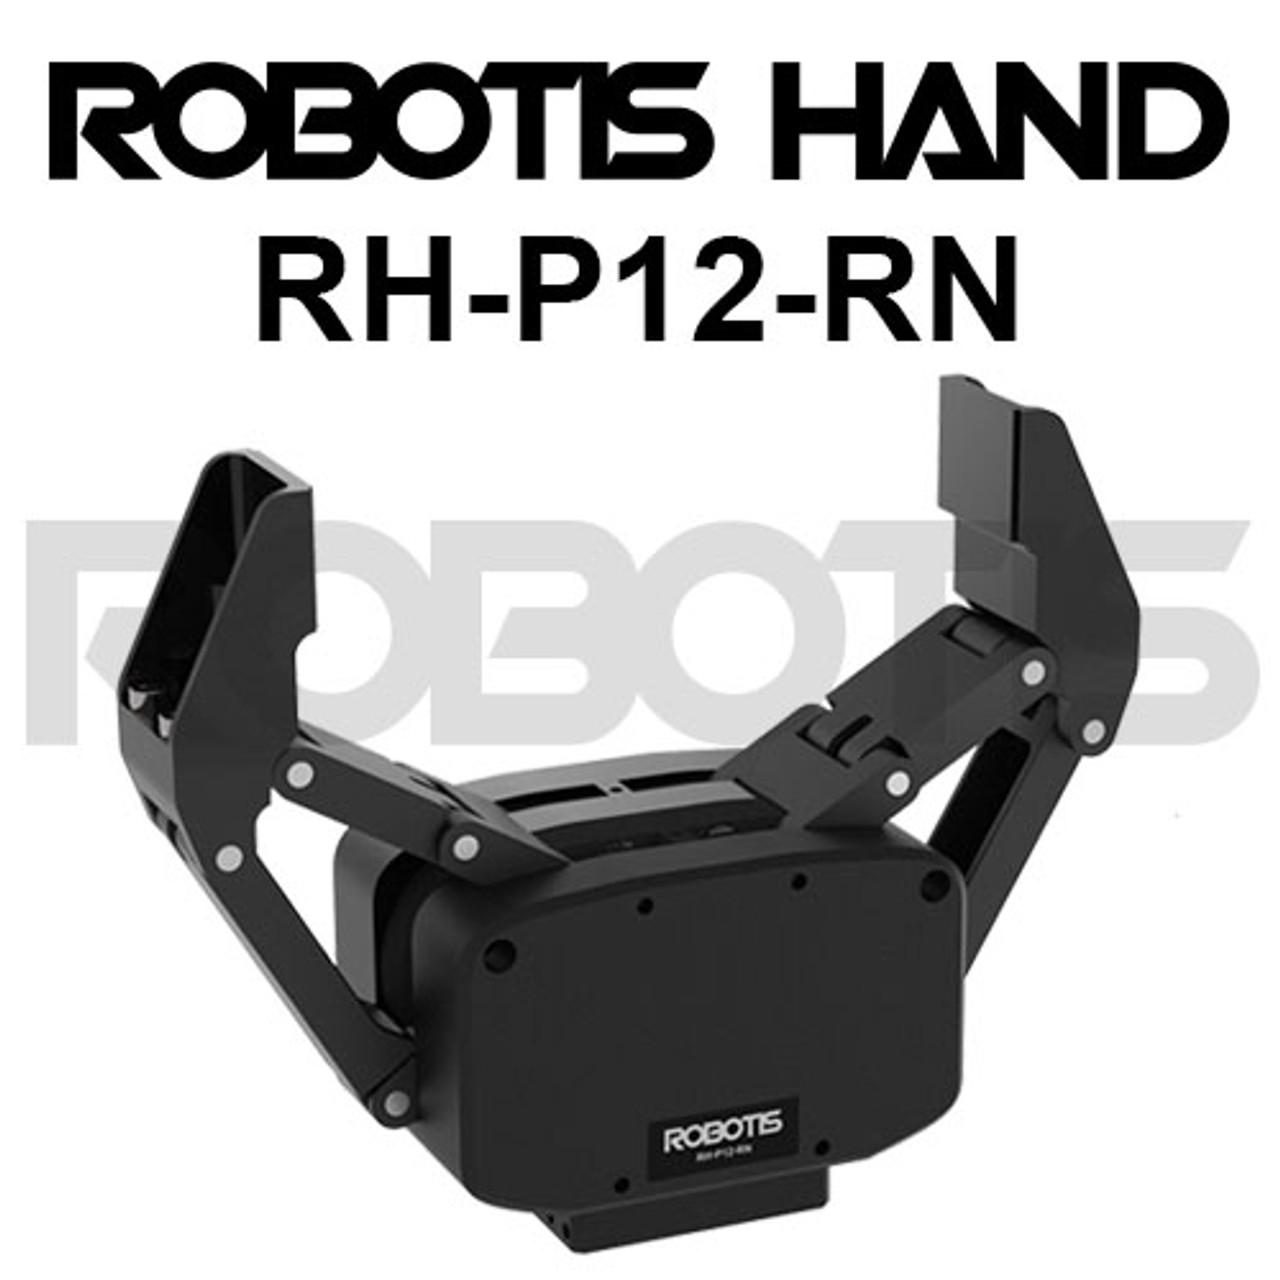 ROBOTIS Hand RH-P12-RN